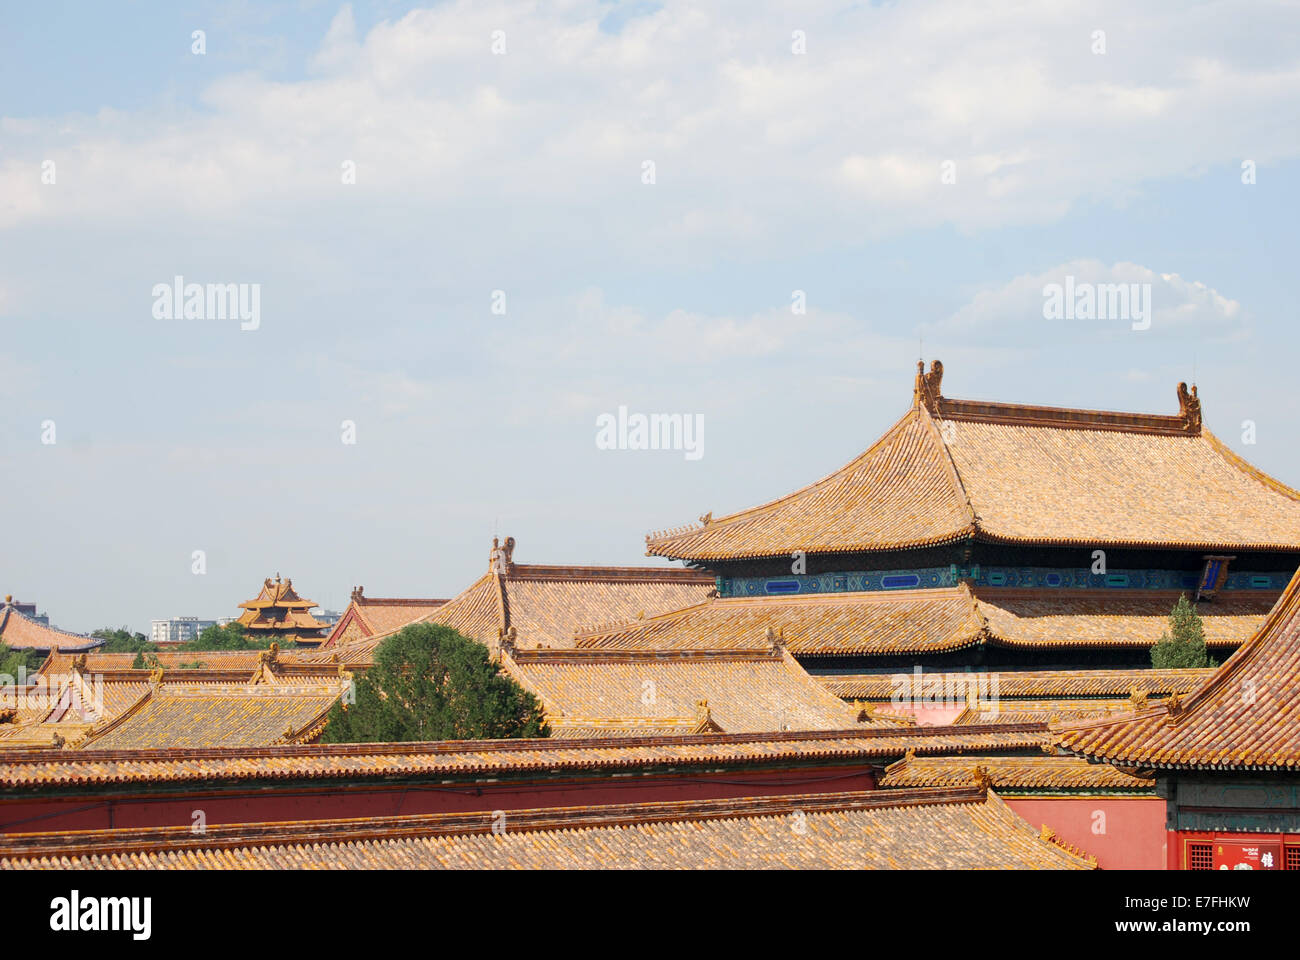 Inside Forbidden Palace, Beijing, China 2014 - Stock Image